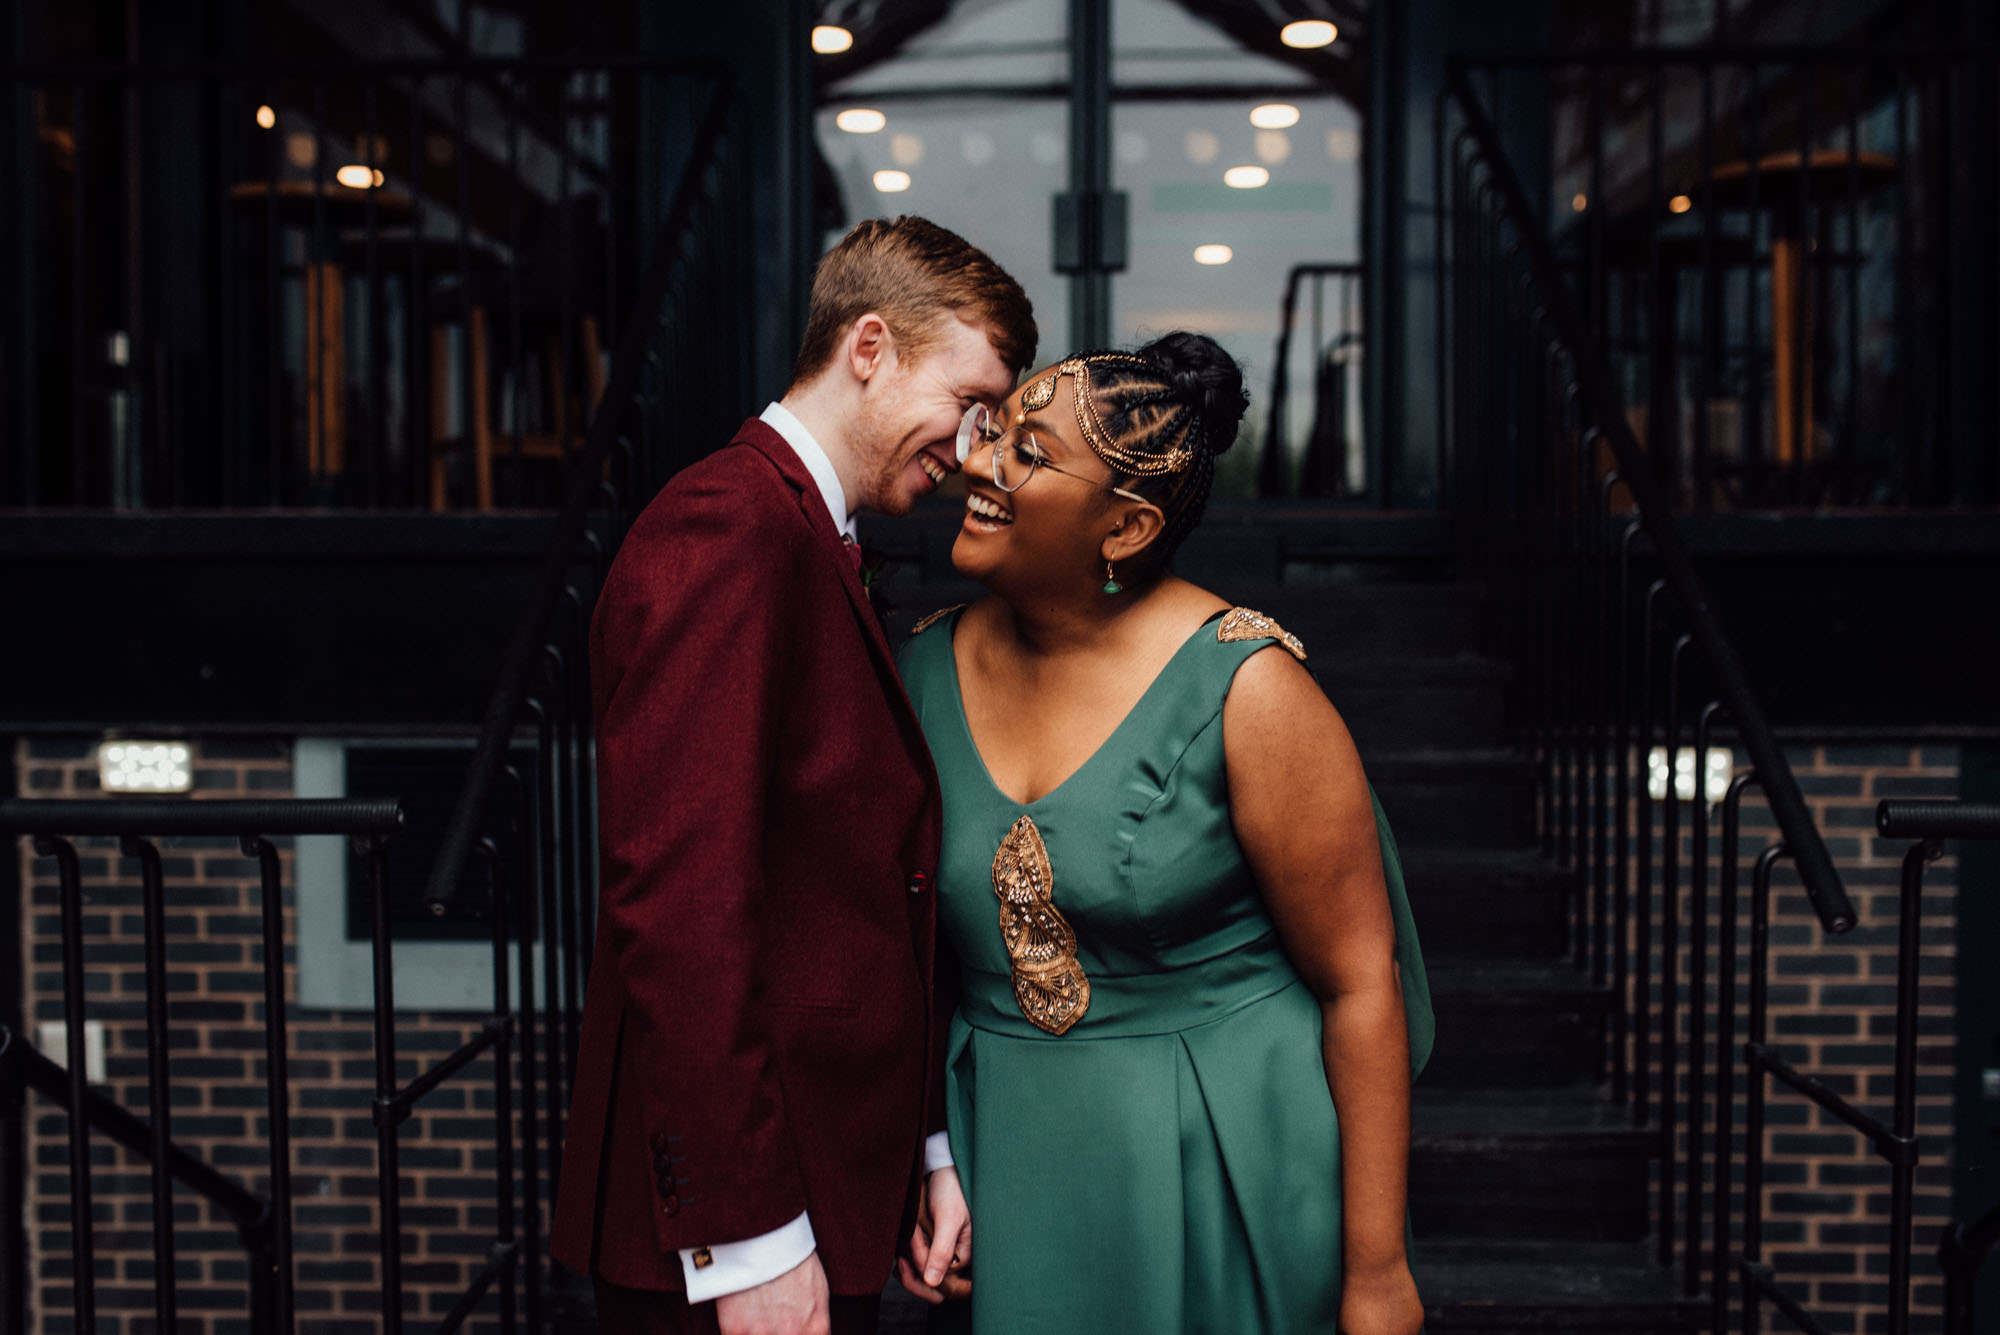 Marni V Photography - Manchester Fun Documentary wedding